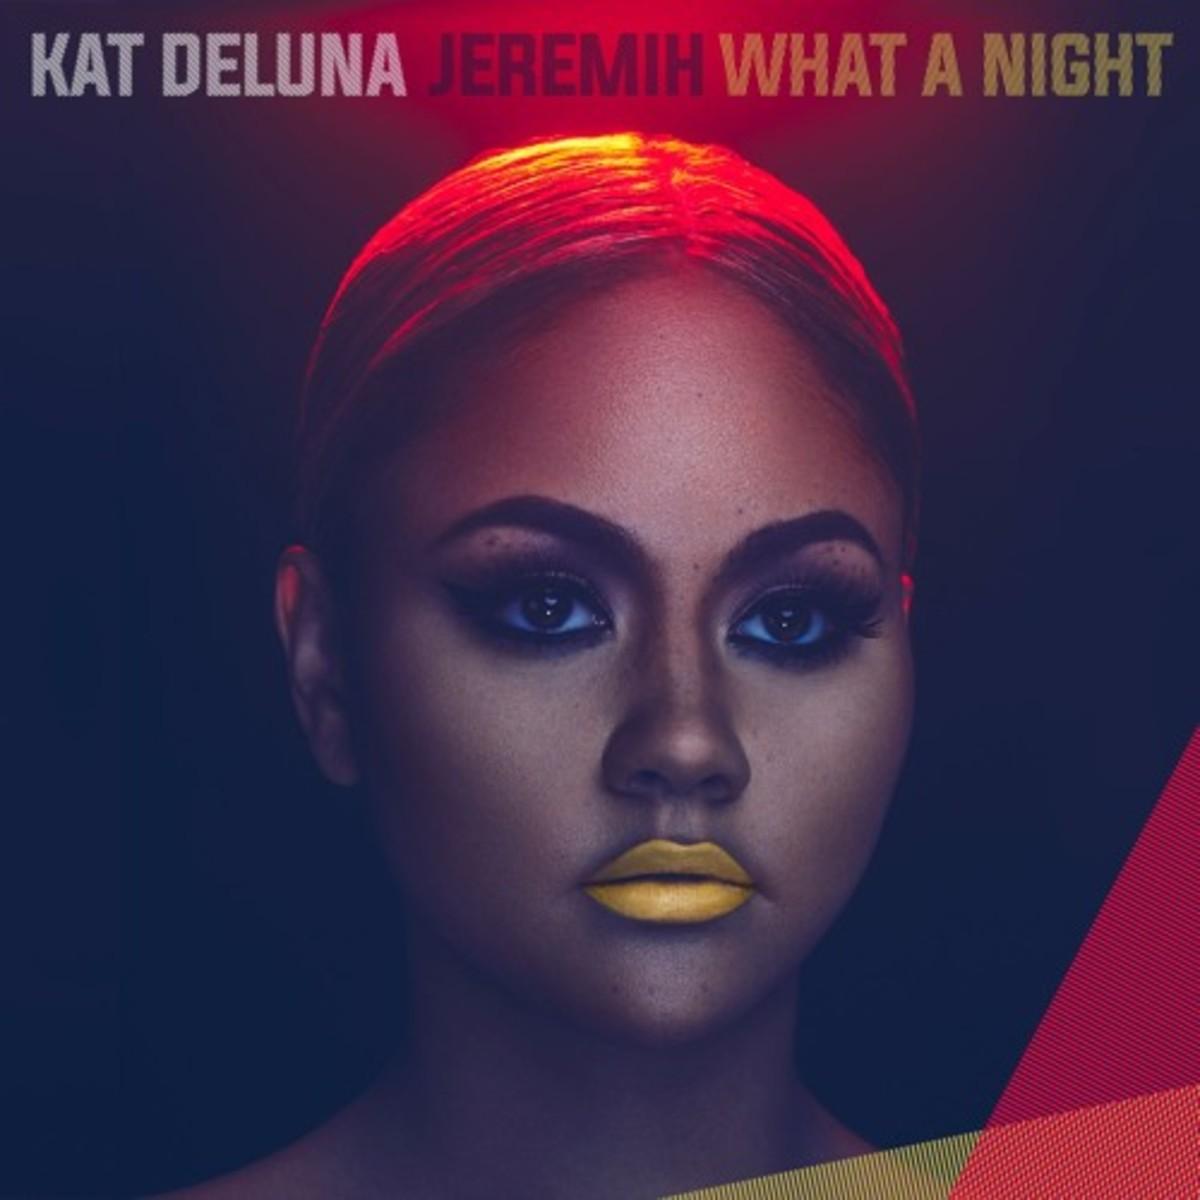 kat-deluna-what-a-night.jpg